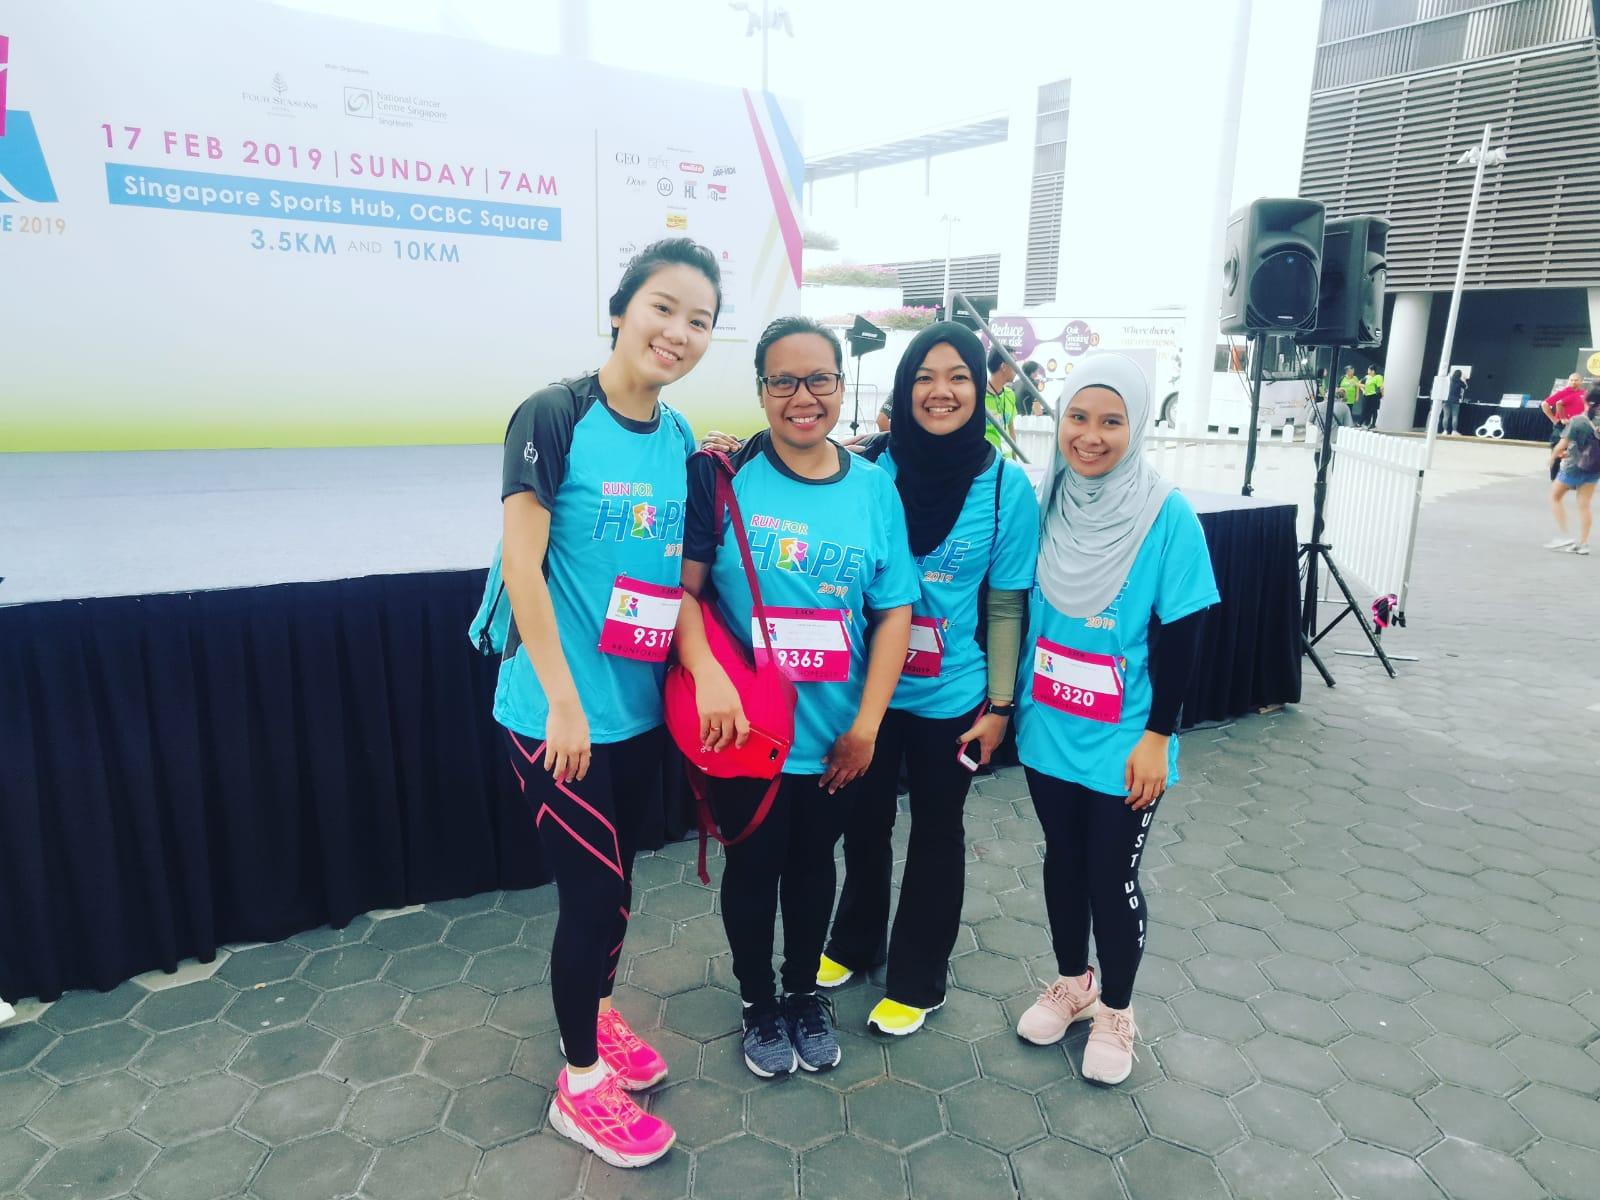 activpayroll Singapore Run for Hope